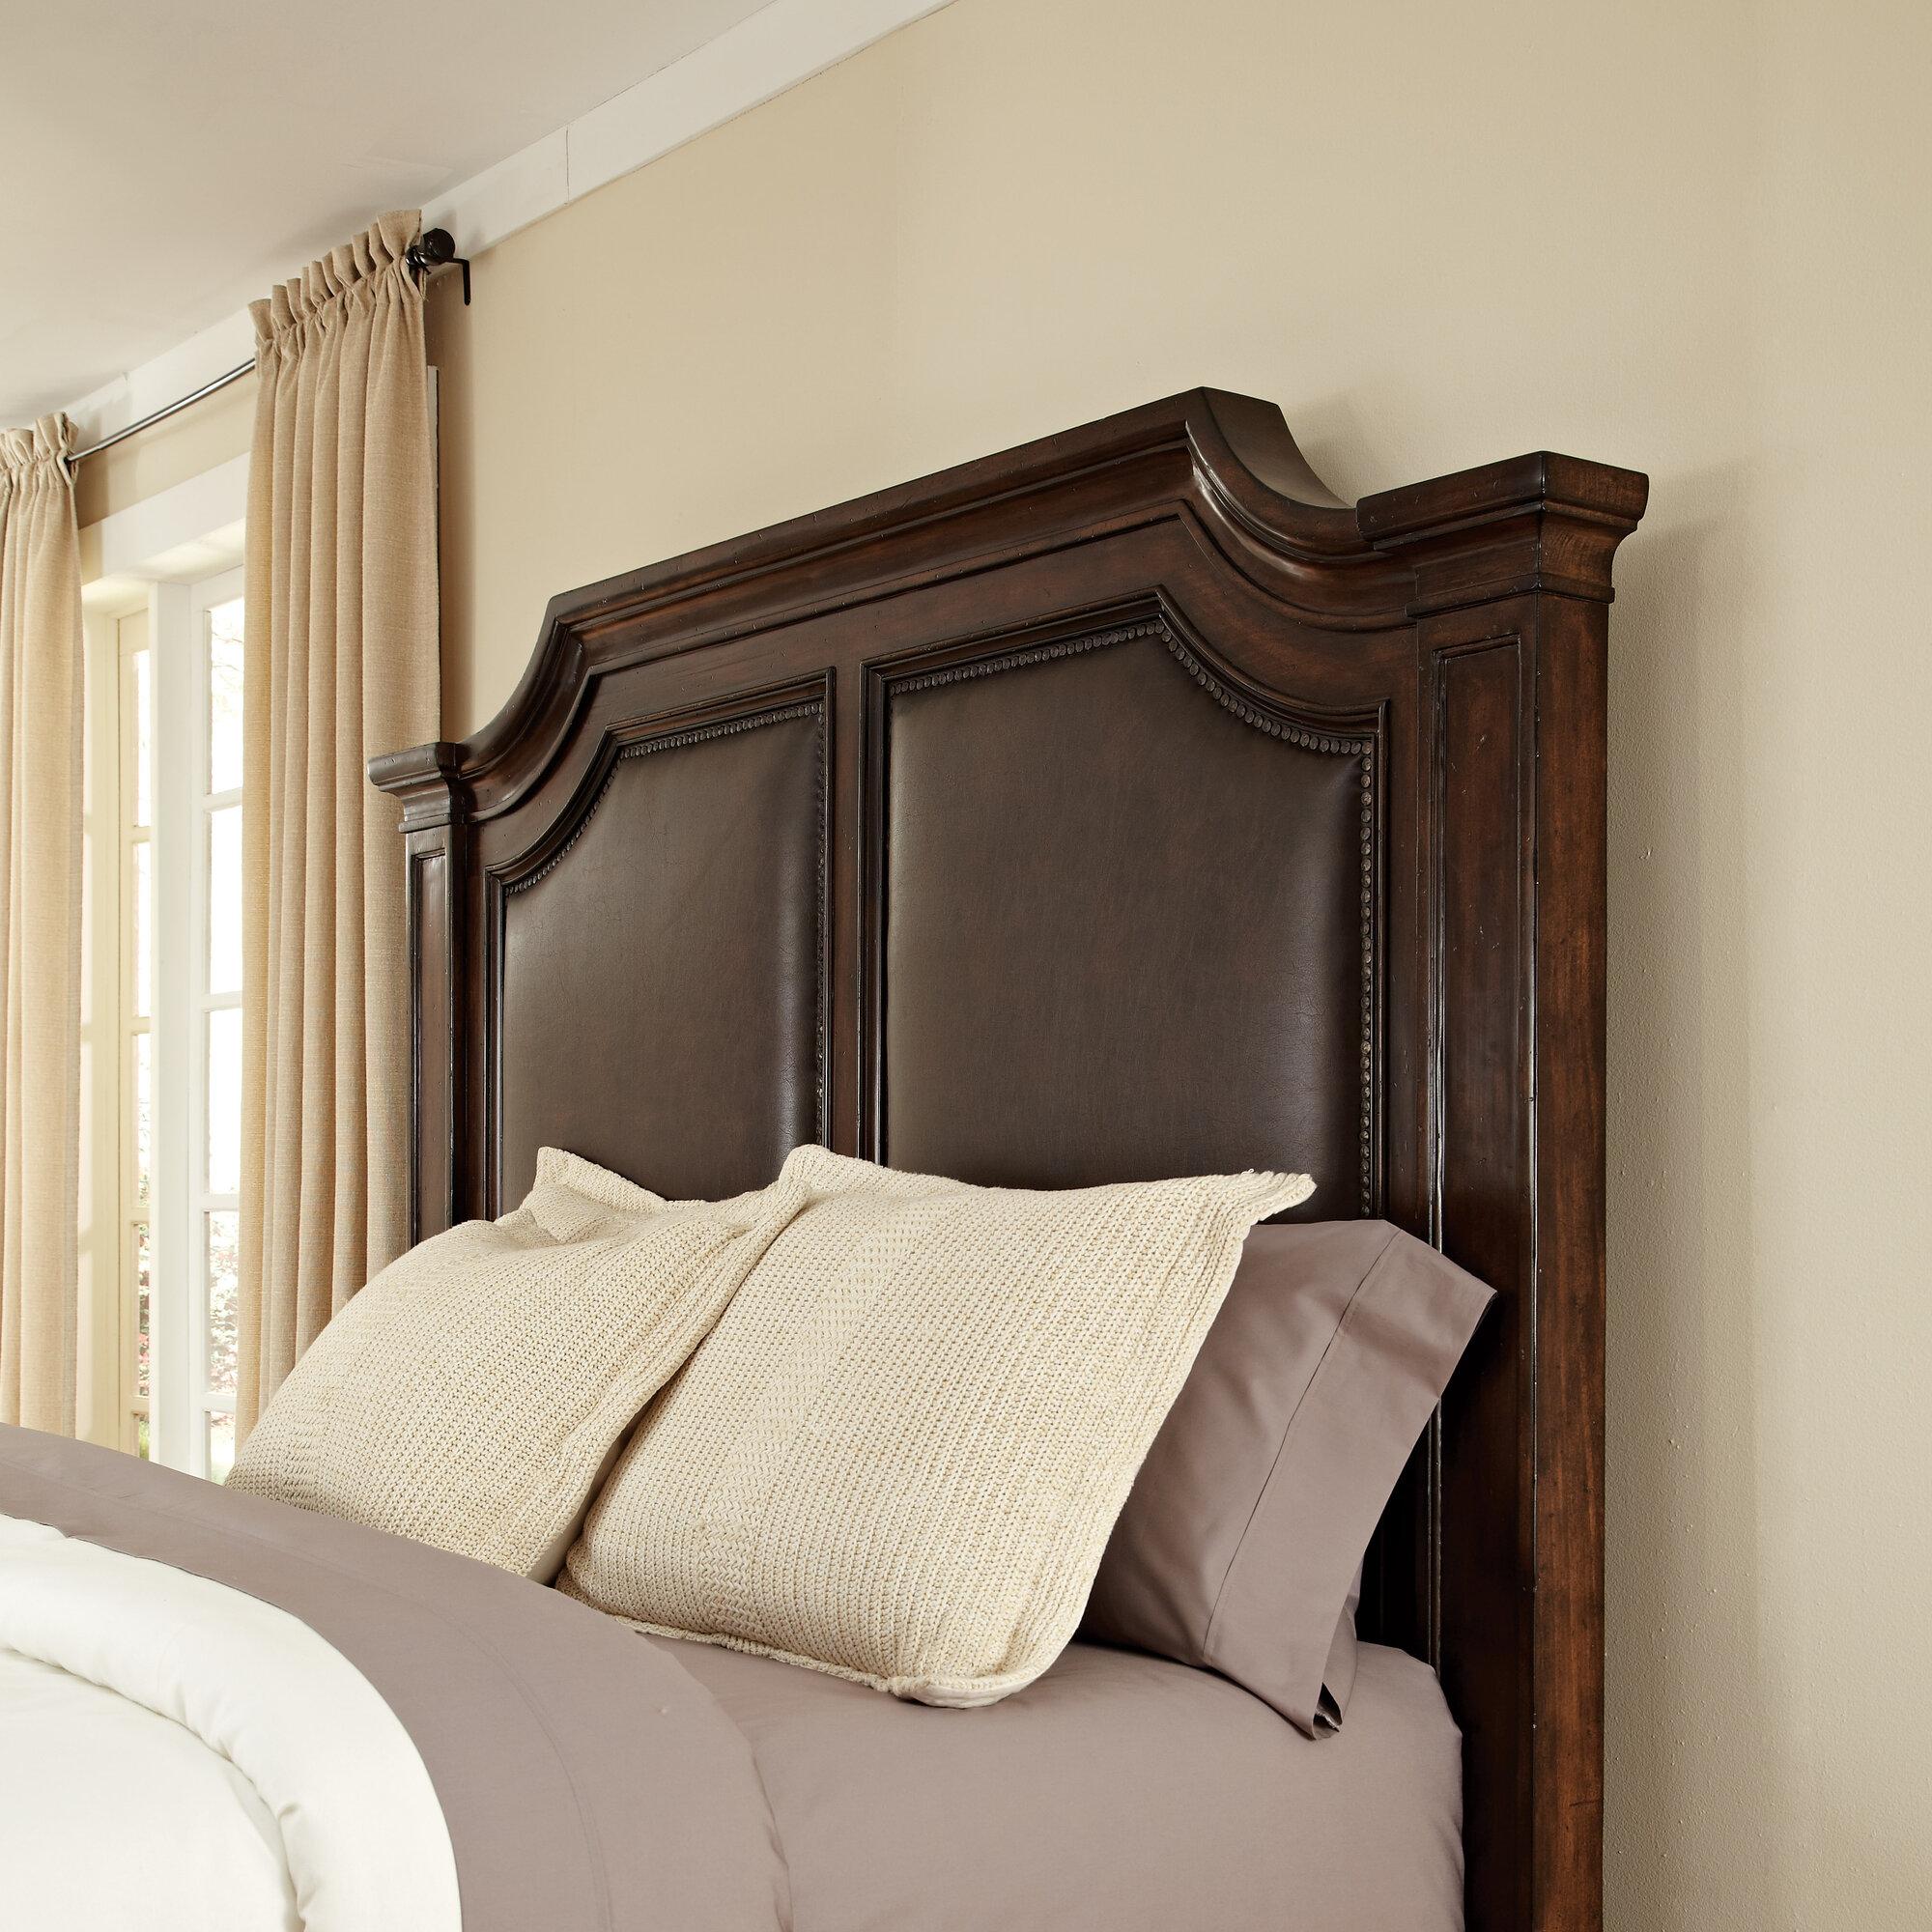 A.R.T. Egerton Upholstered Headboard Size: Full / Queen